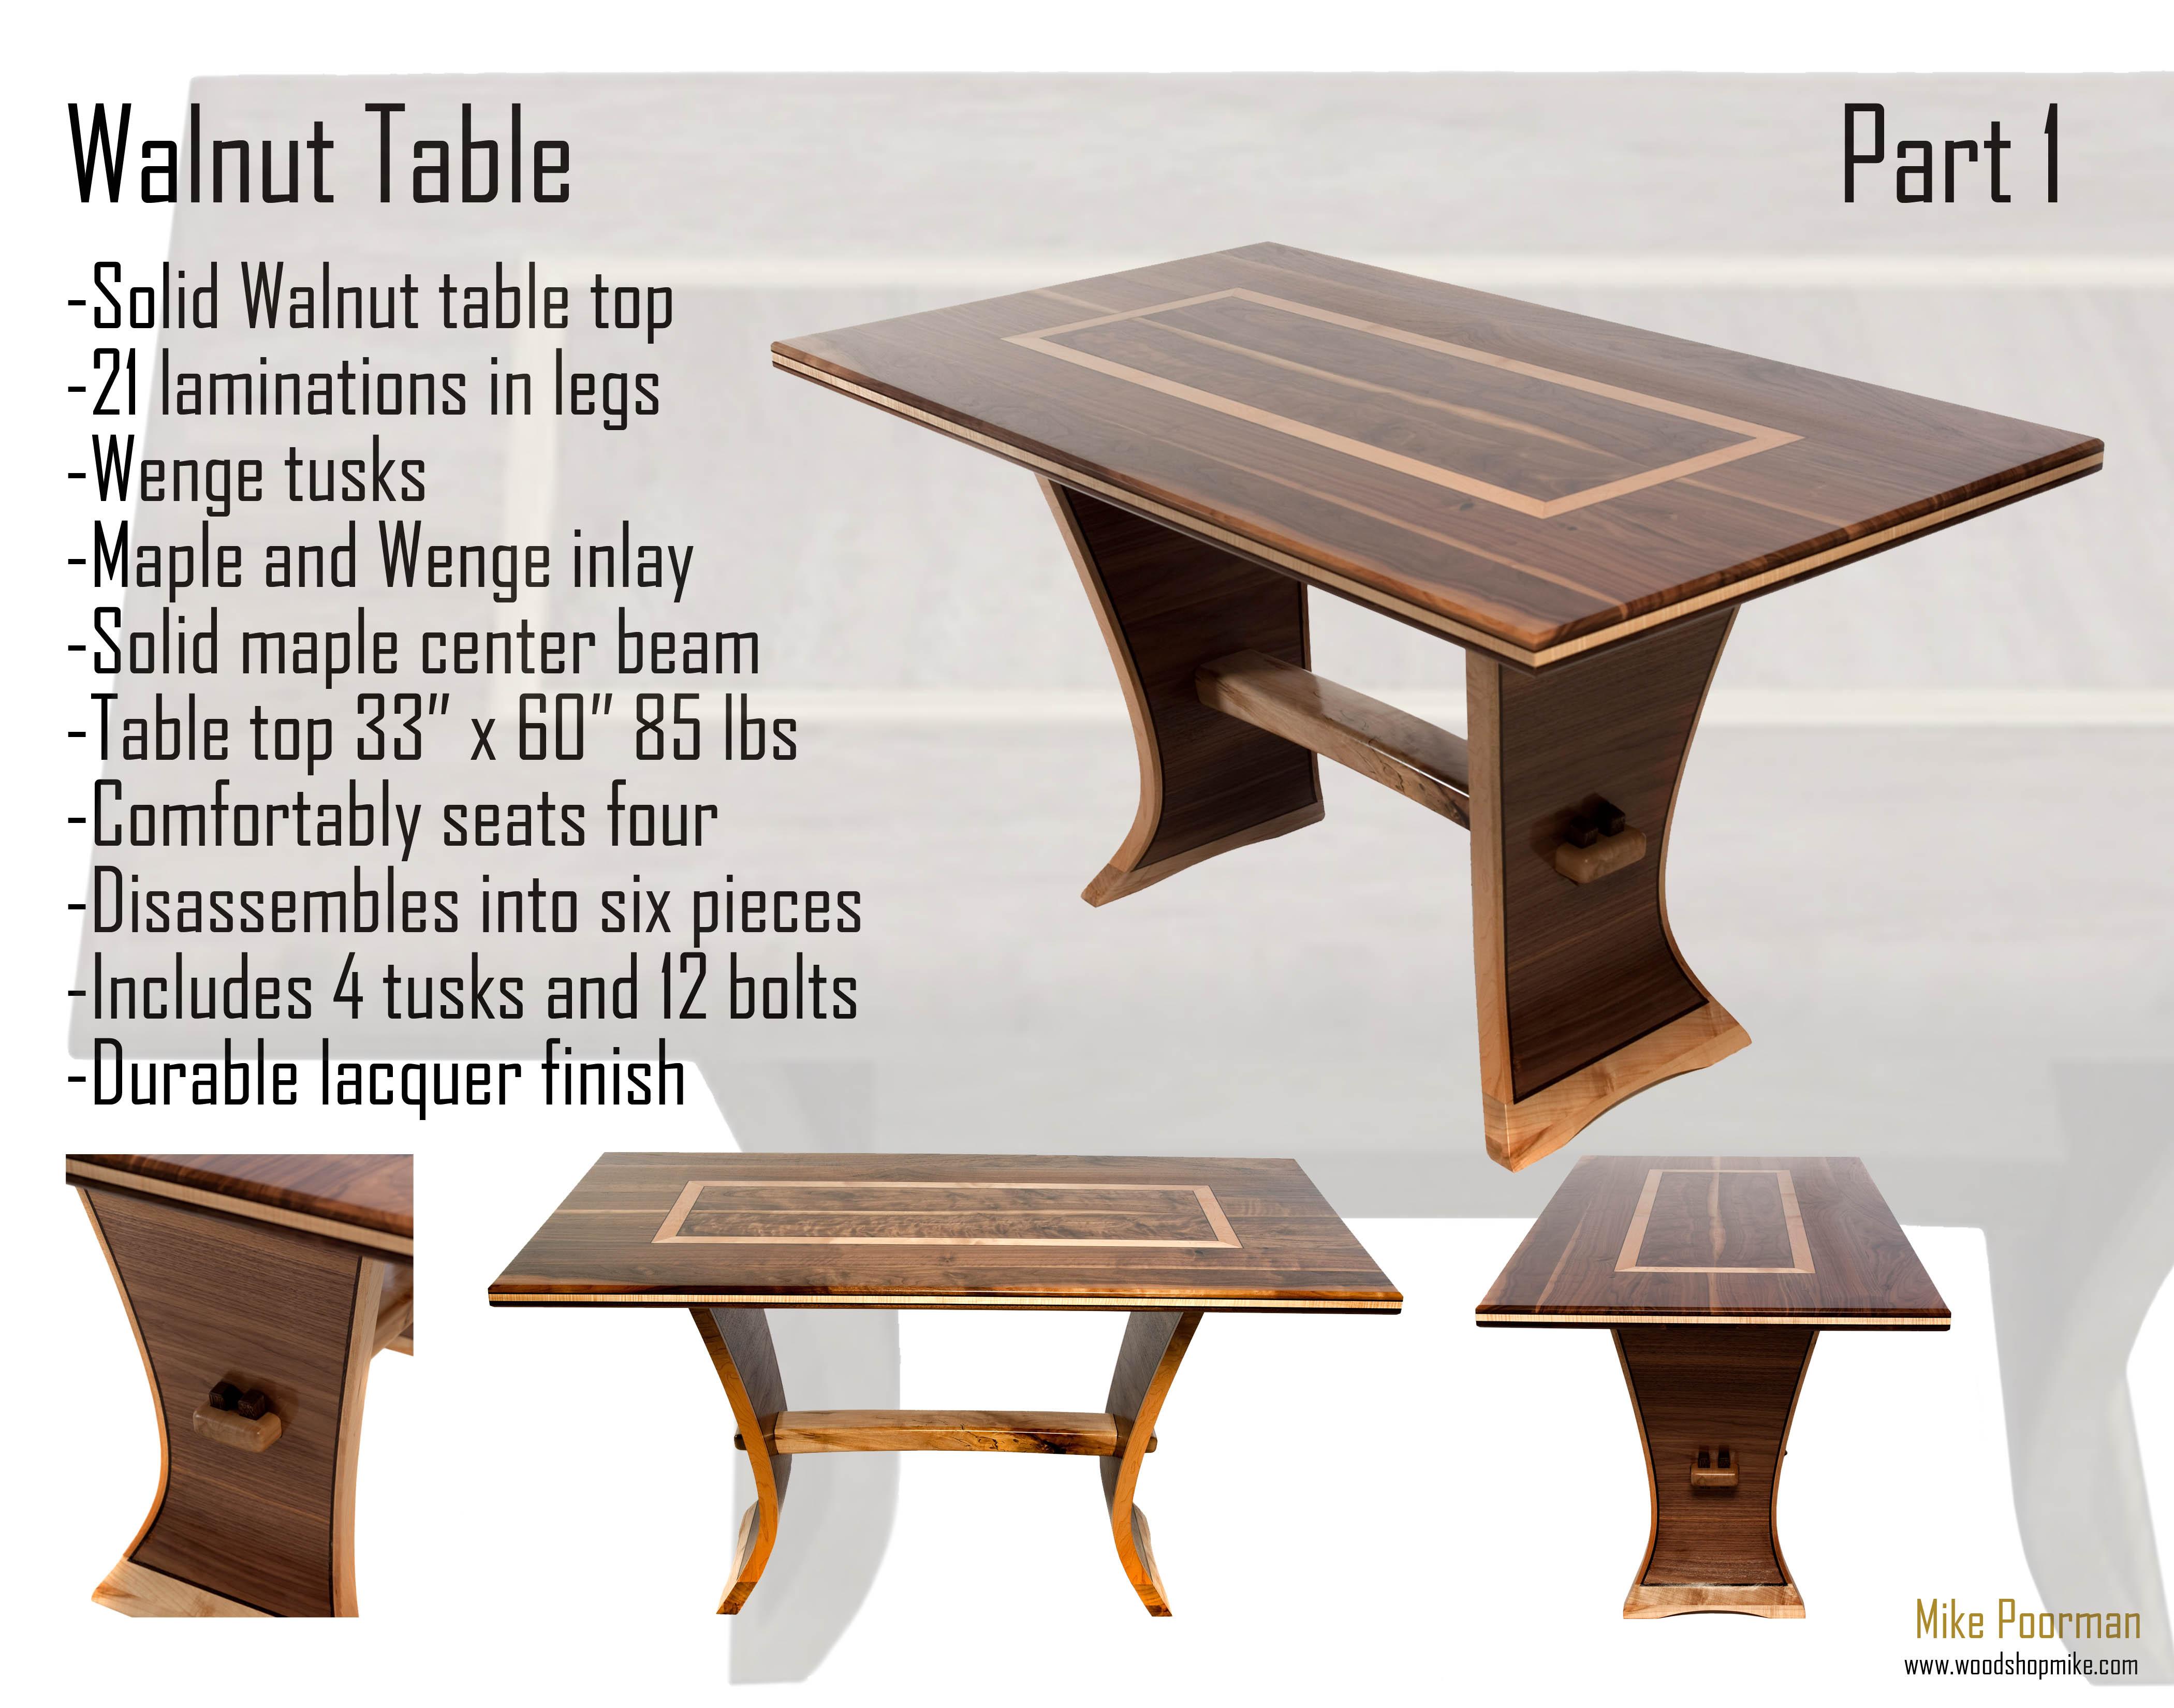 Walnut Trestle Table Video 1 of 3